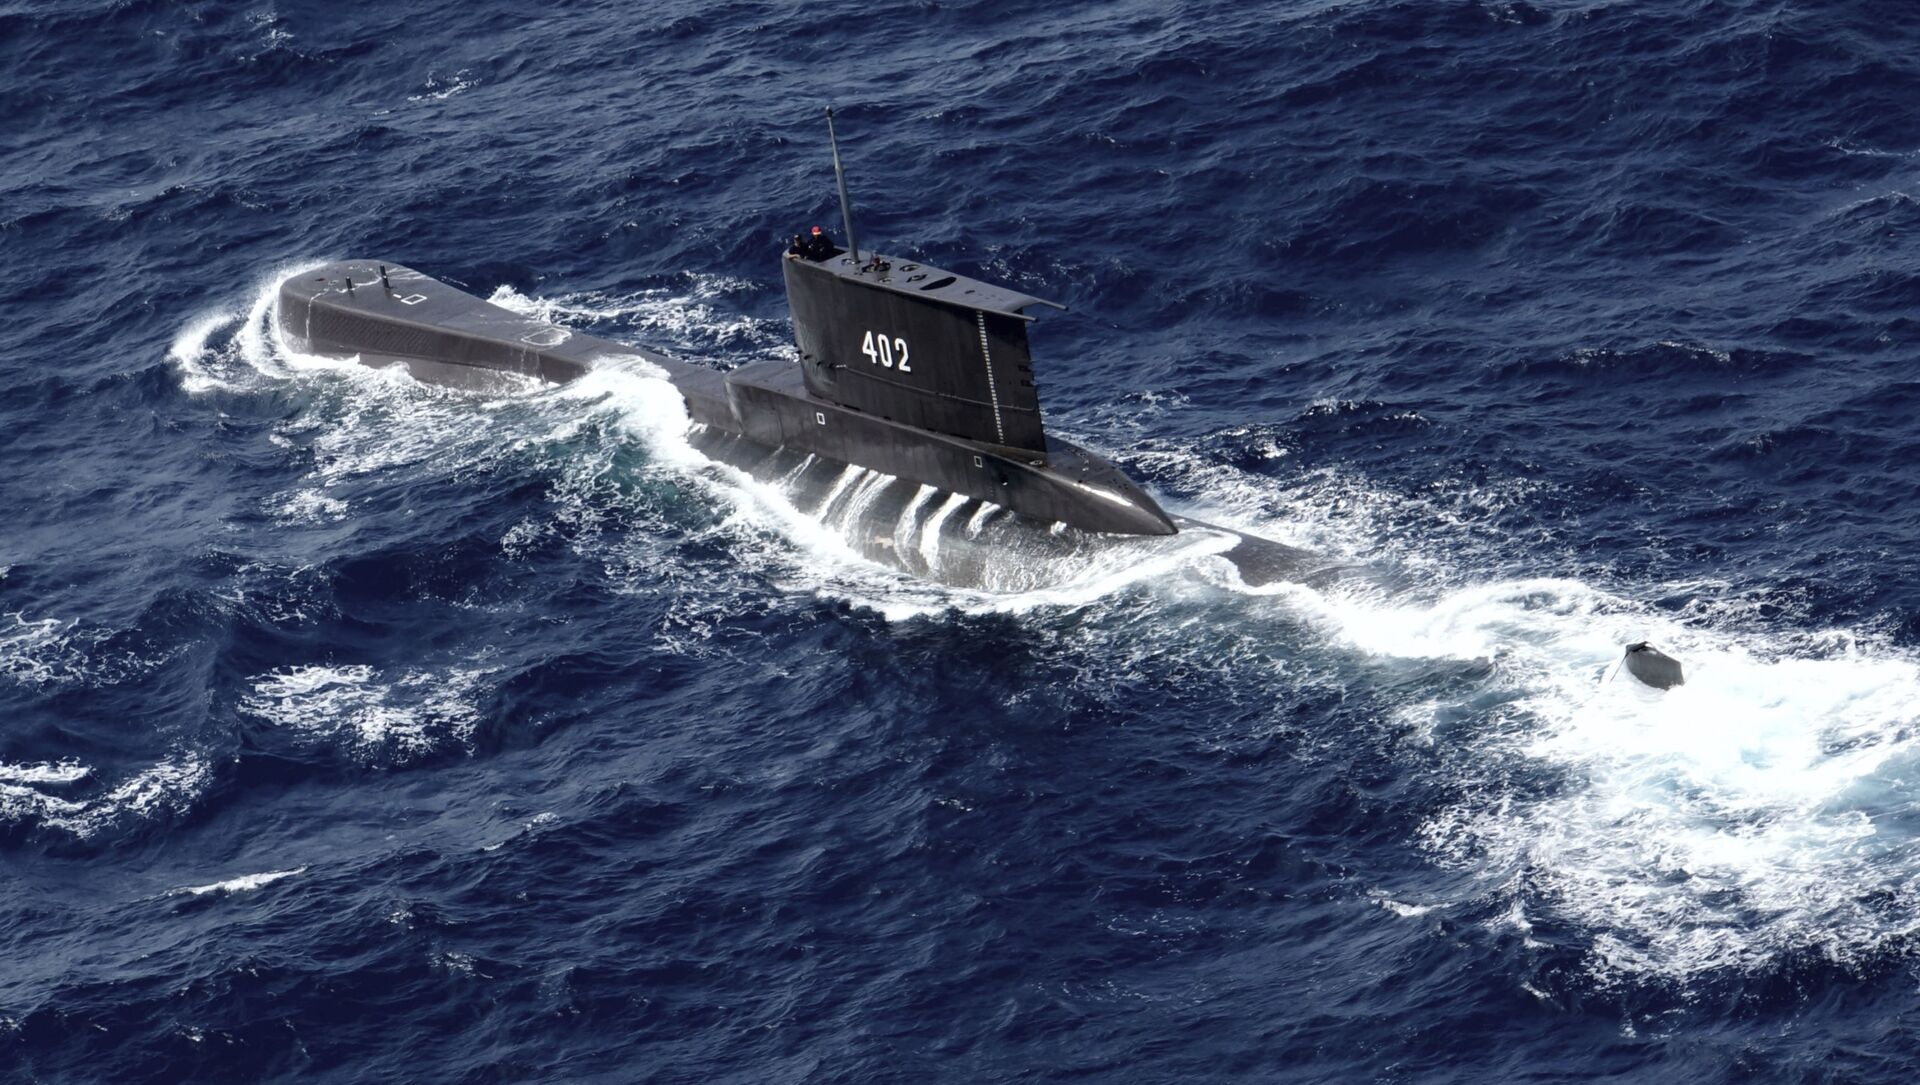 Il sottomarino indonesiano KRI Nanggala - Sputnik Italia, 1920, 22.04.2021